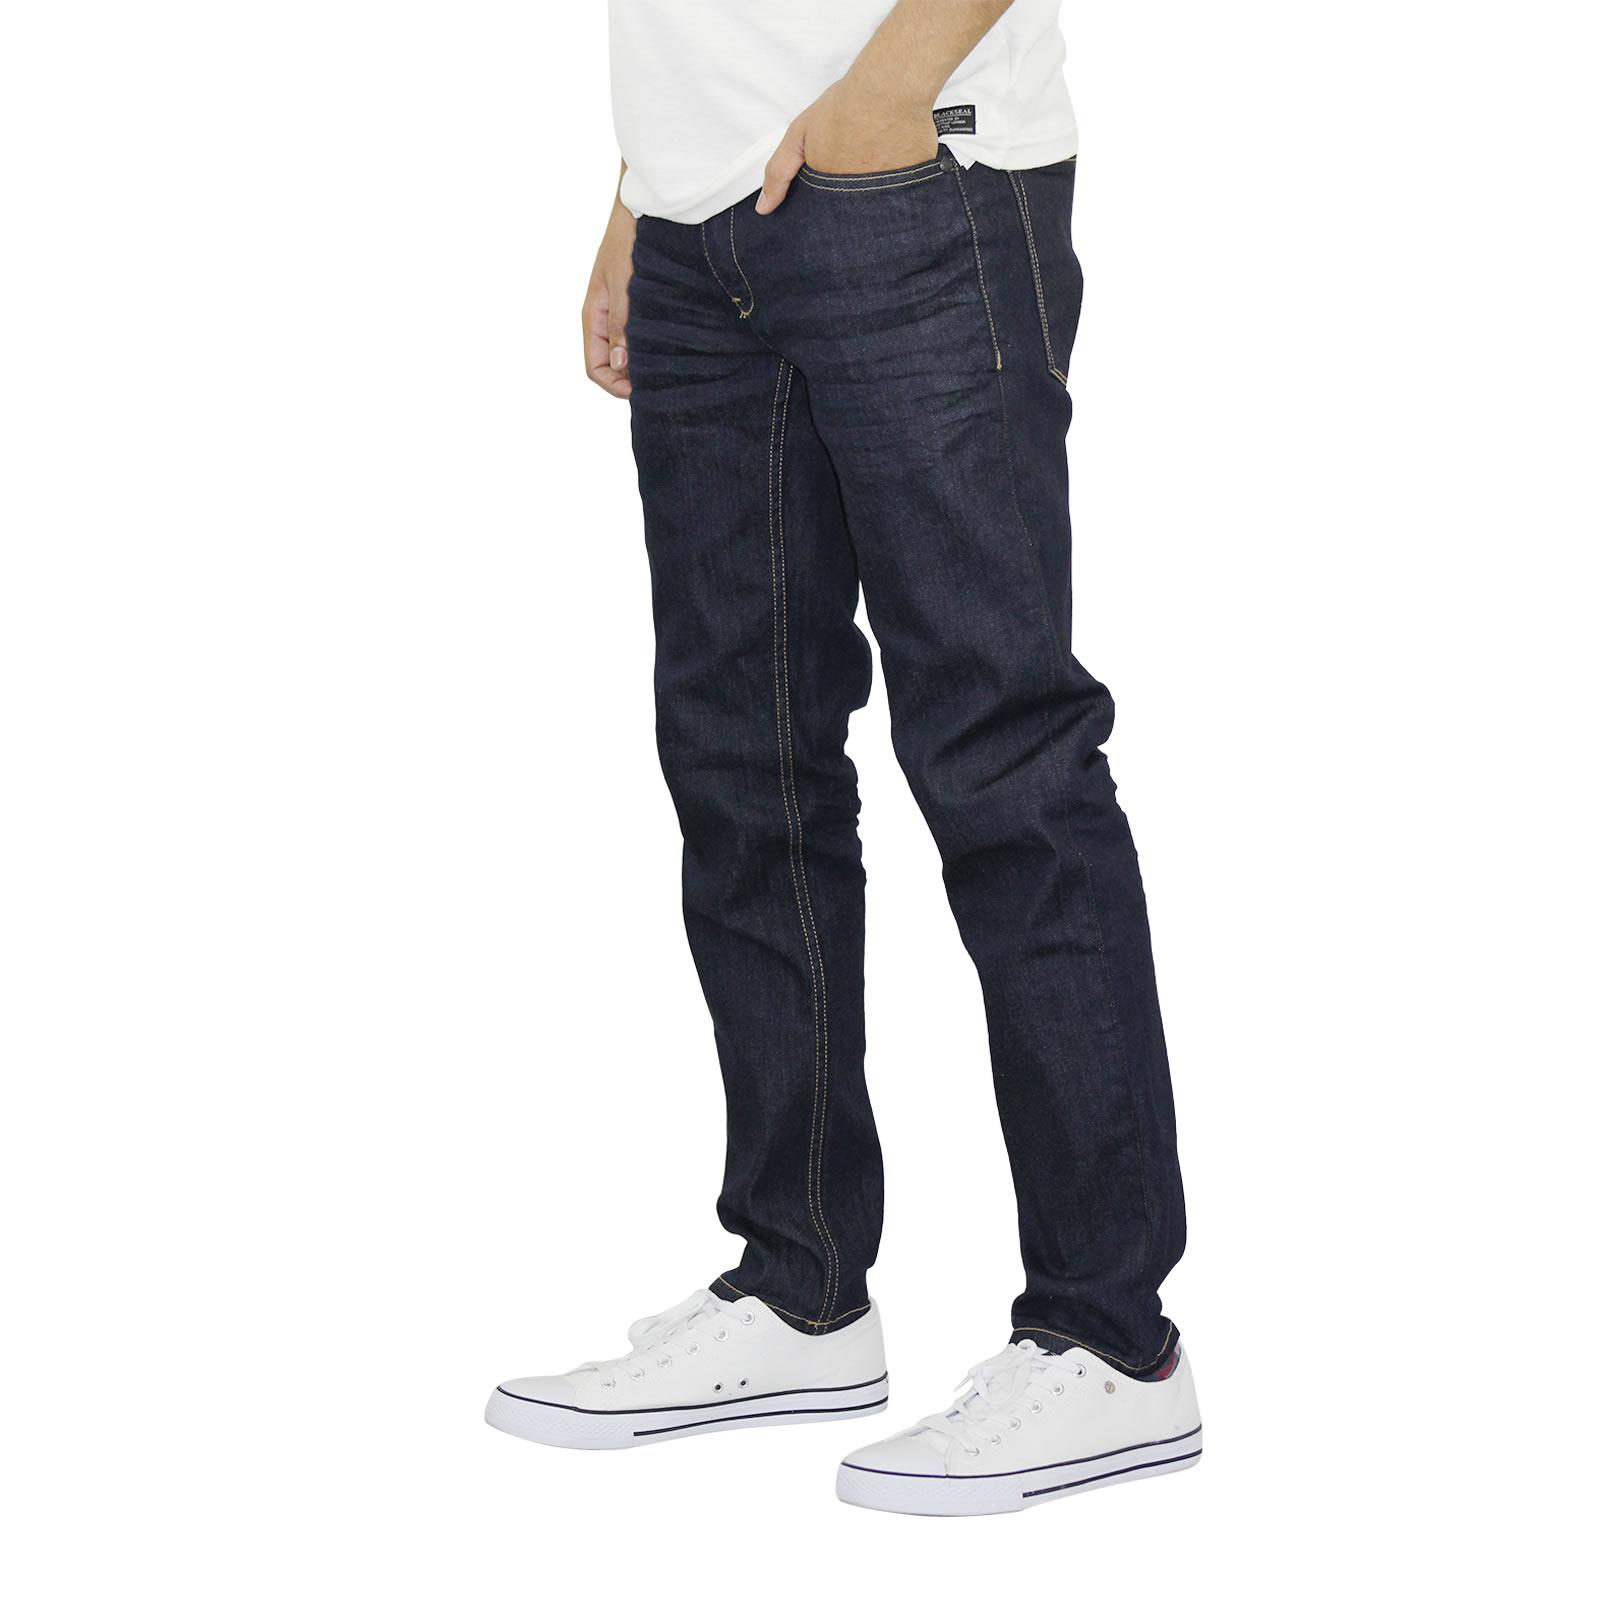 miniature 12 - Homme Crosshatch Jaco Slim Jeans stretch pantalon denim effet vieilli